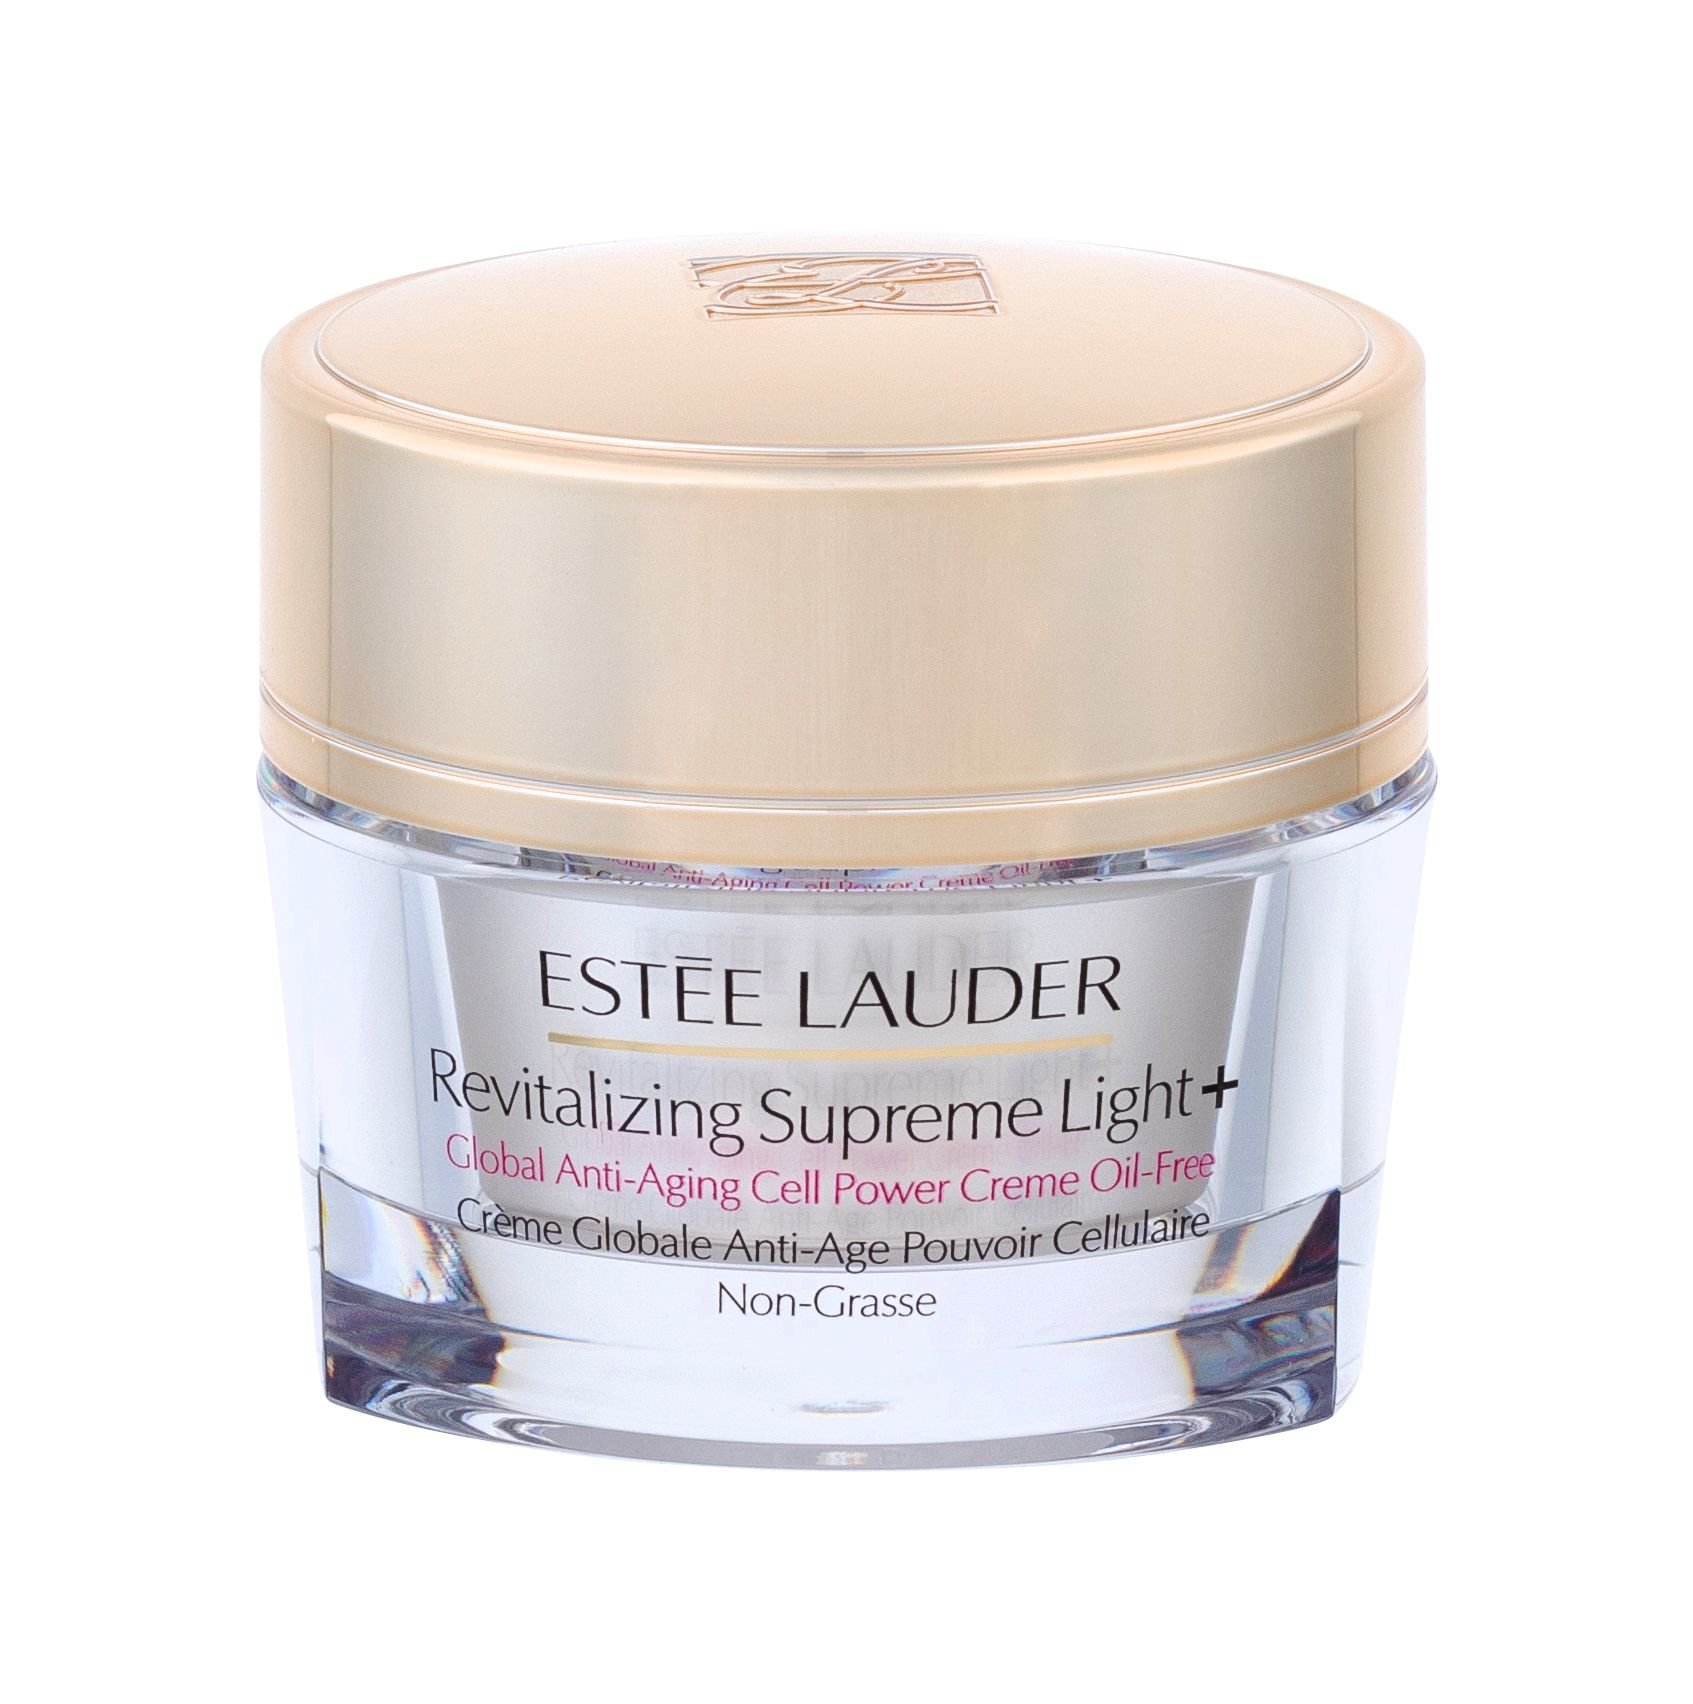 Estée Lauder Revitalizing Supreme Light+ Day Cream 30ml